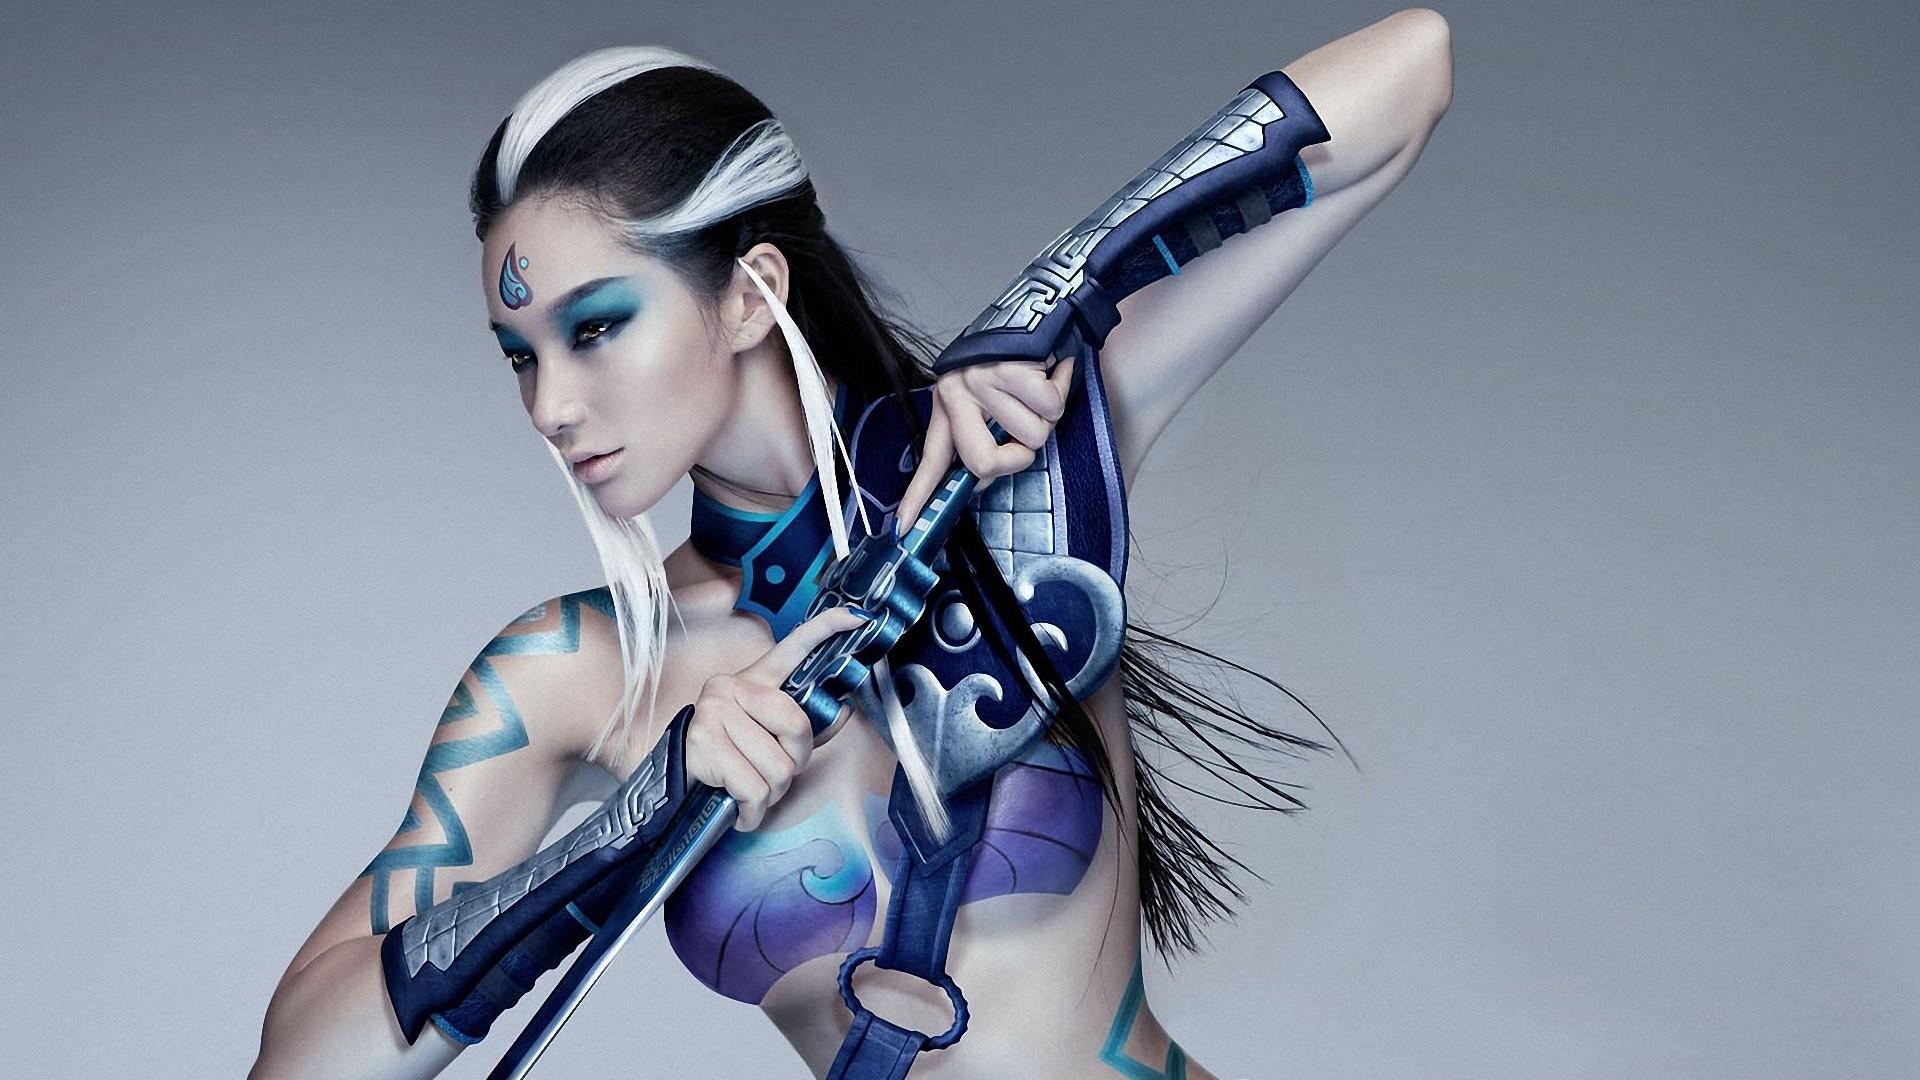 People 1920x1080 women cosplay brunette body paint Asian face paint